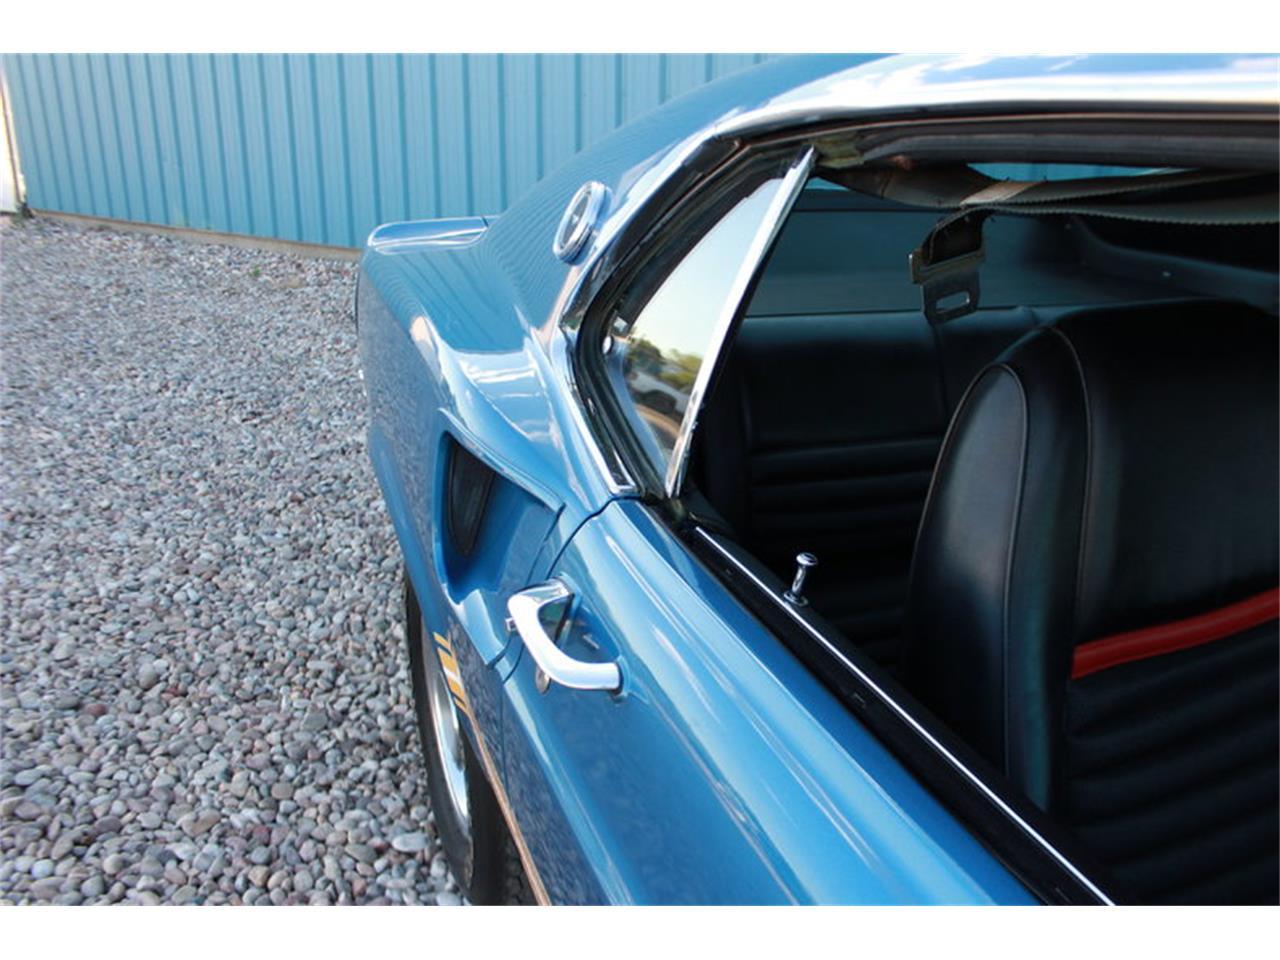 Large Picture of 1969 Mustang located in Vernal Utah - LDCX